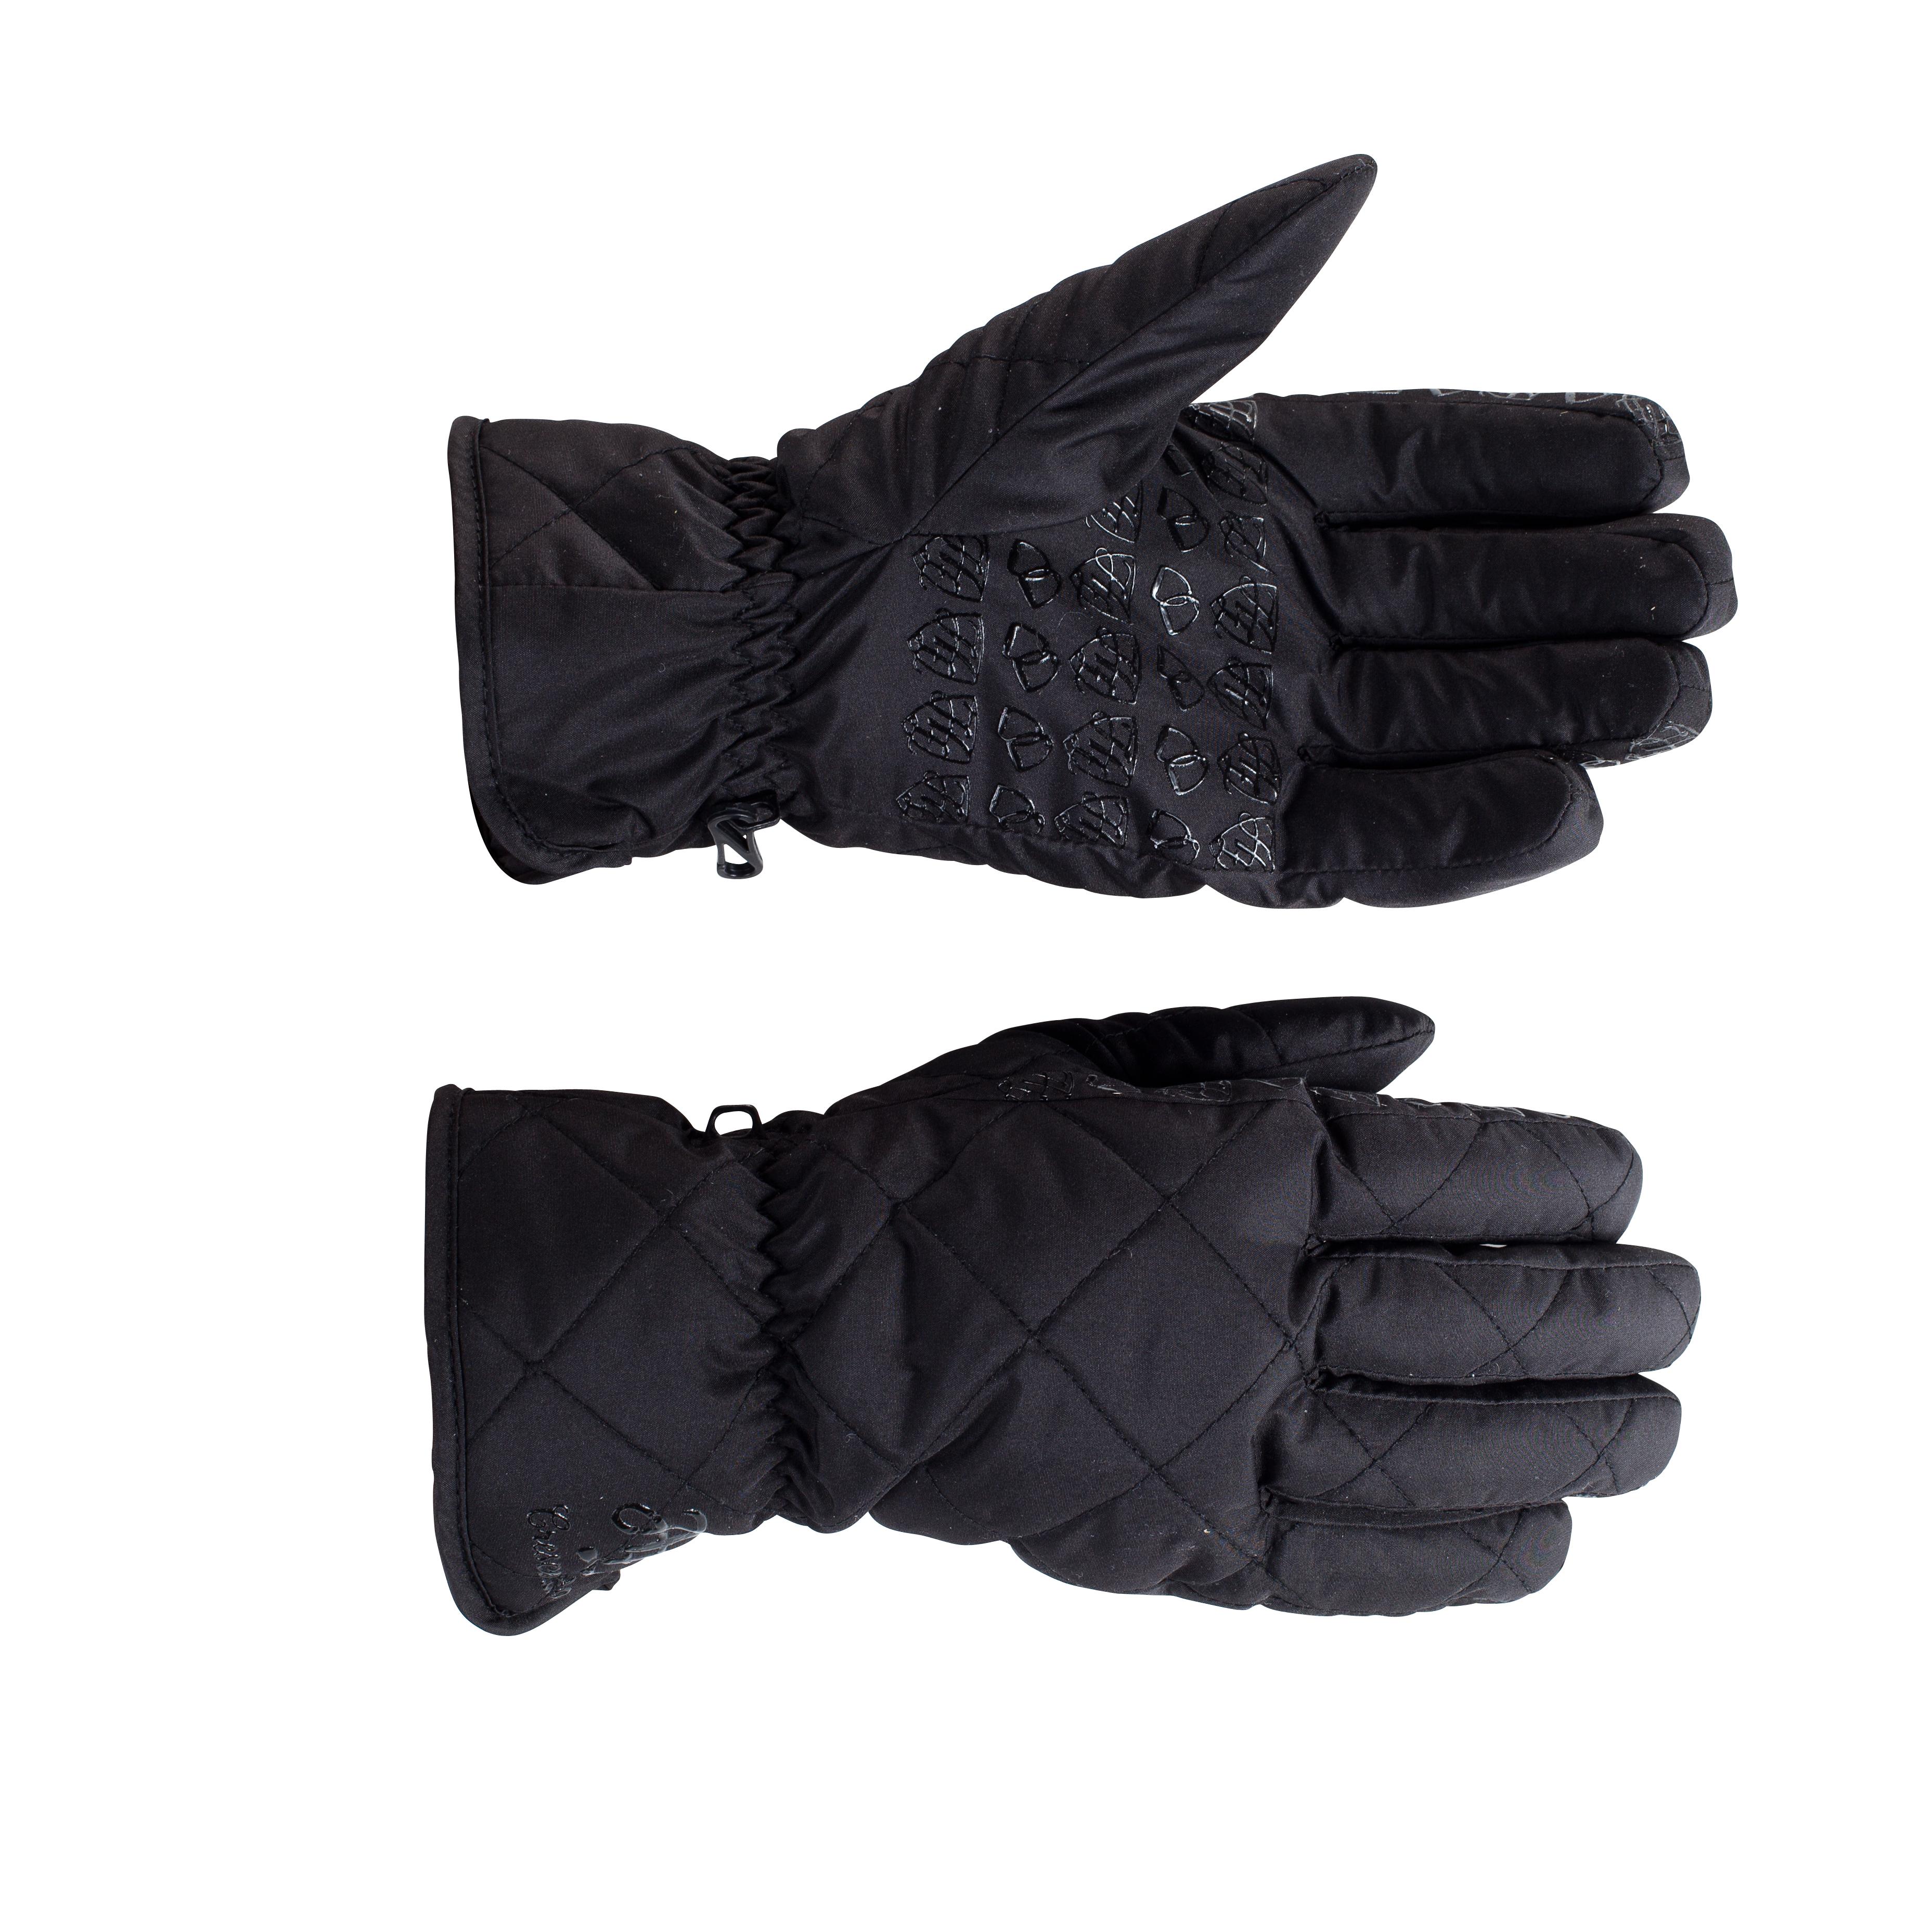 Horze Cora Lightweight Down Gloves